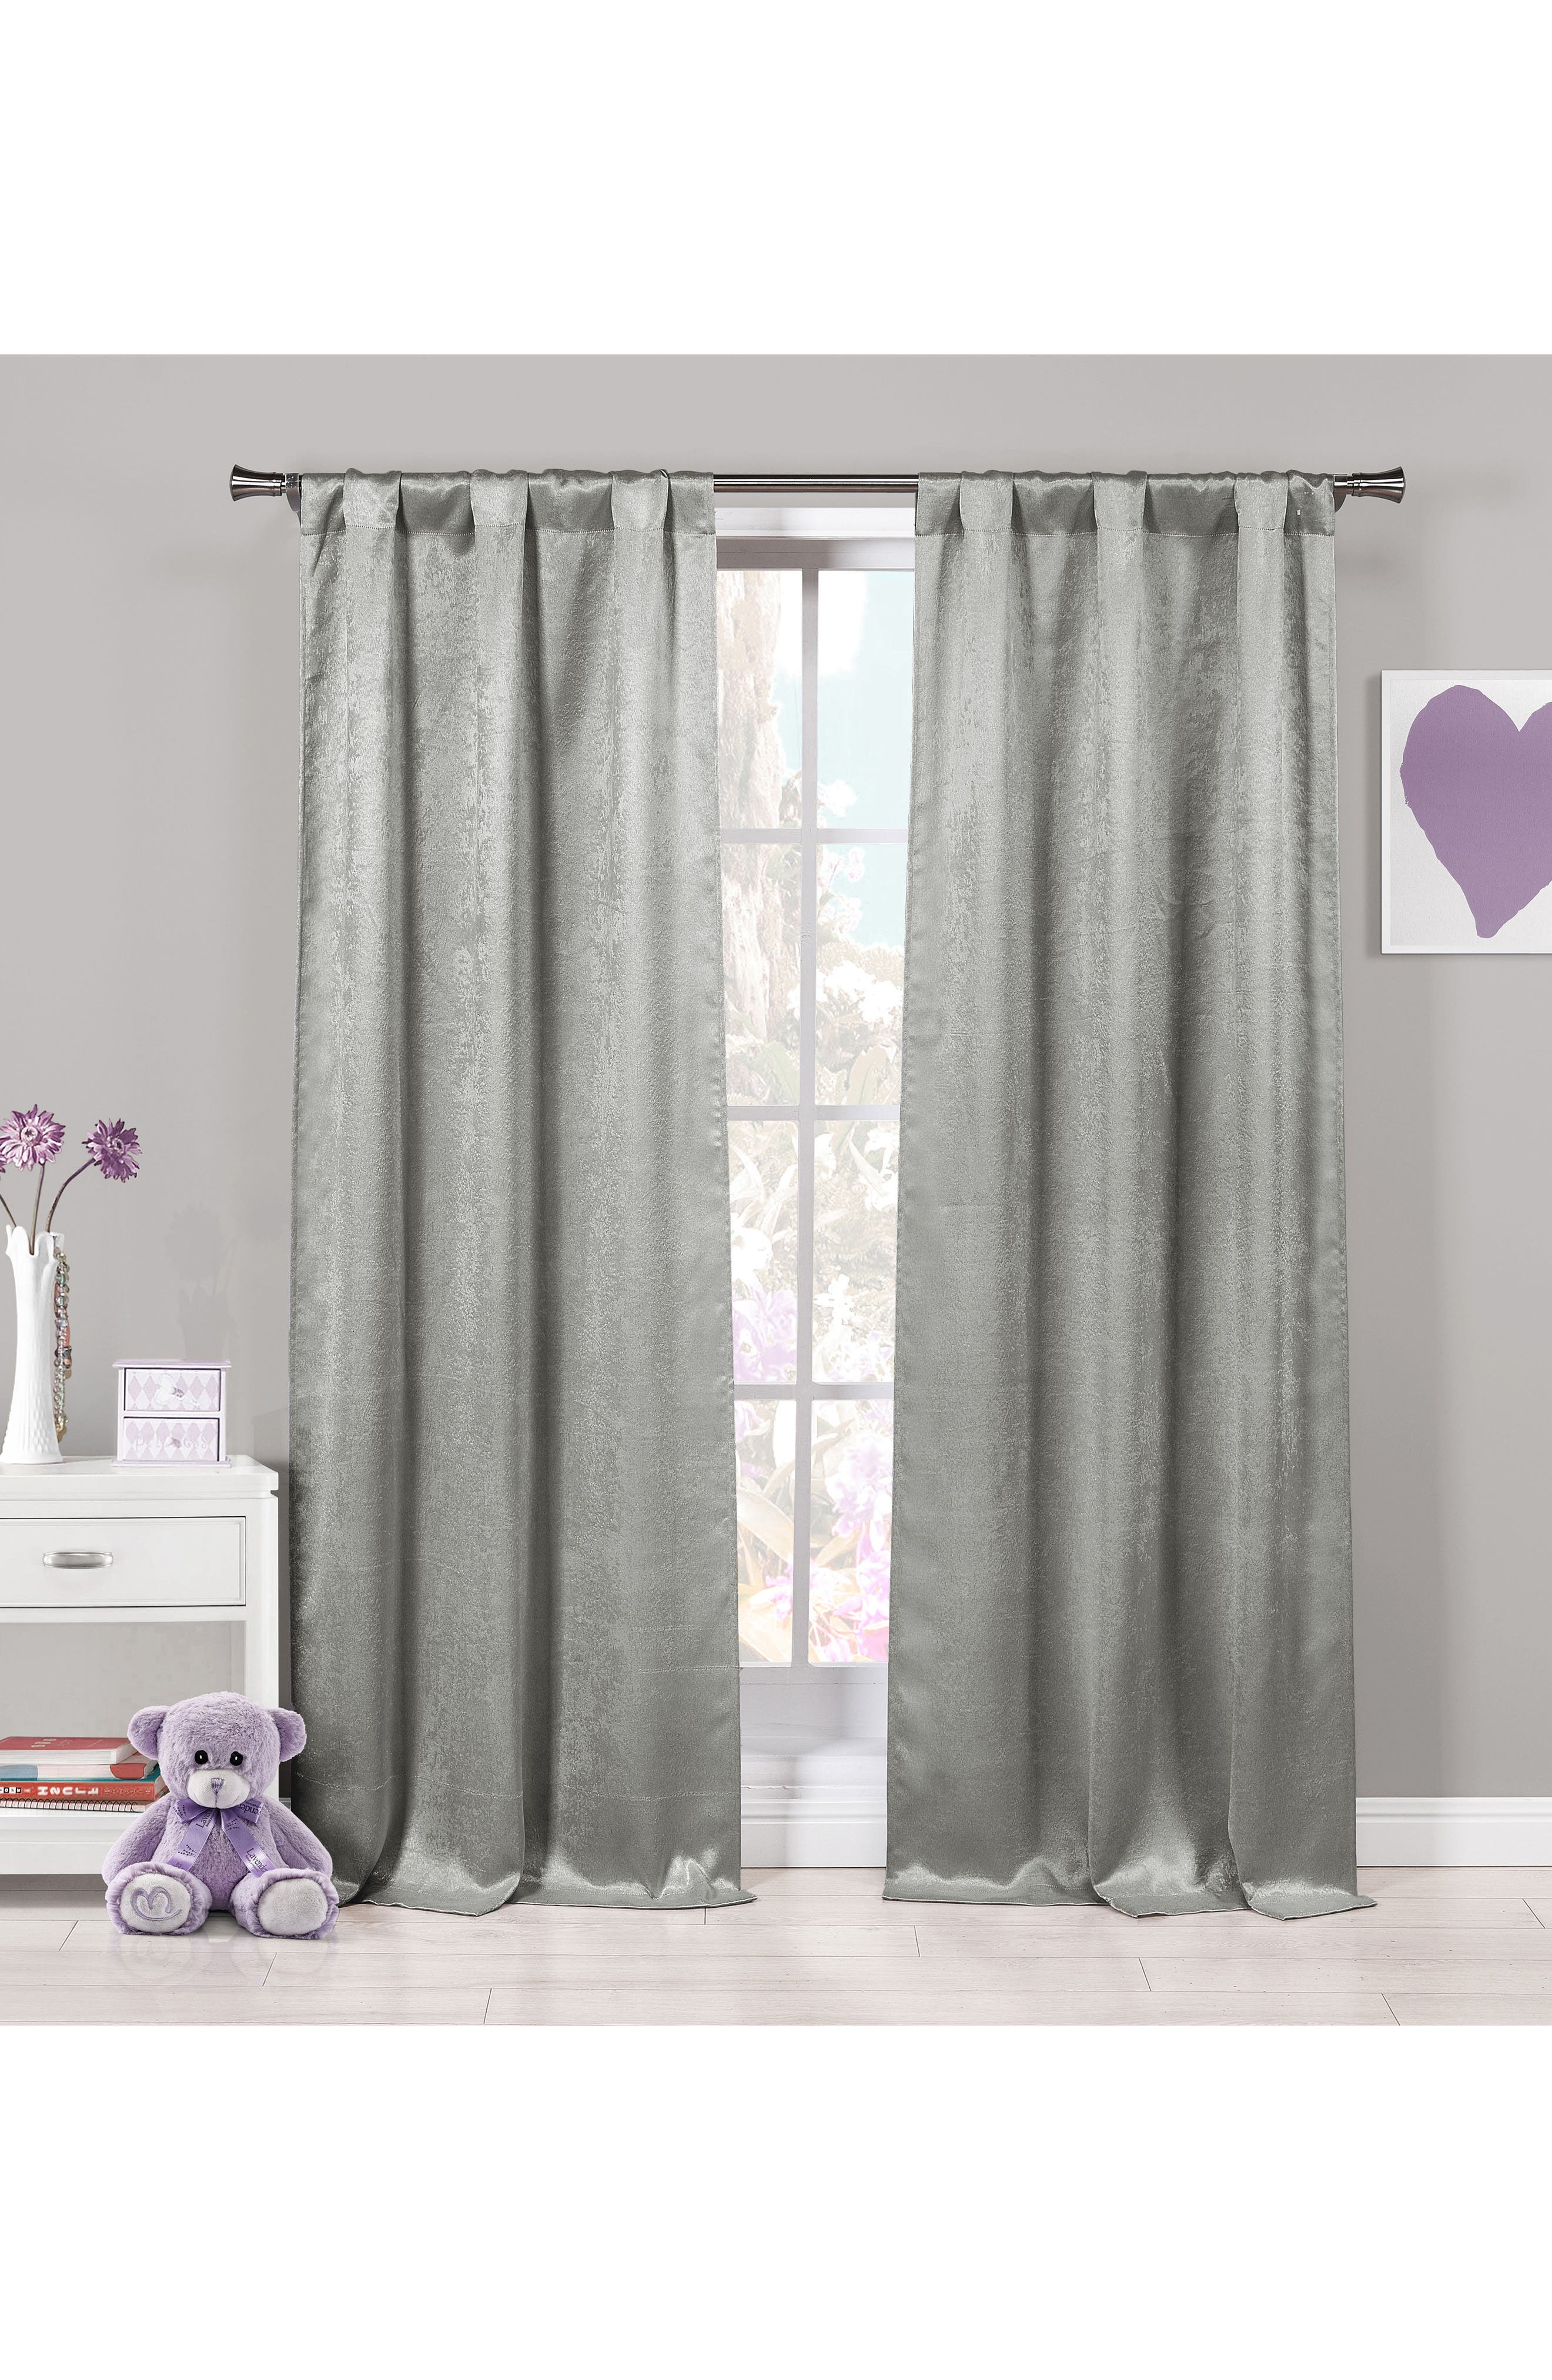 Kohls Dining Room Curtains